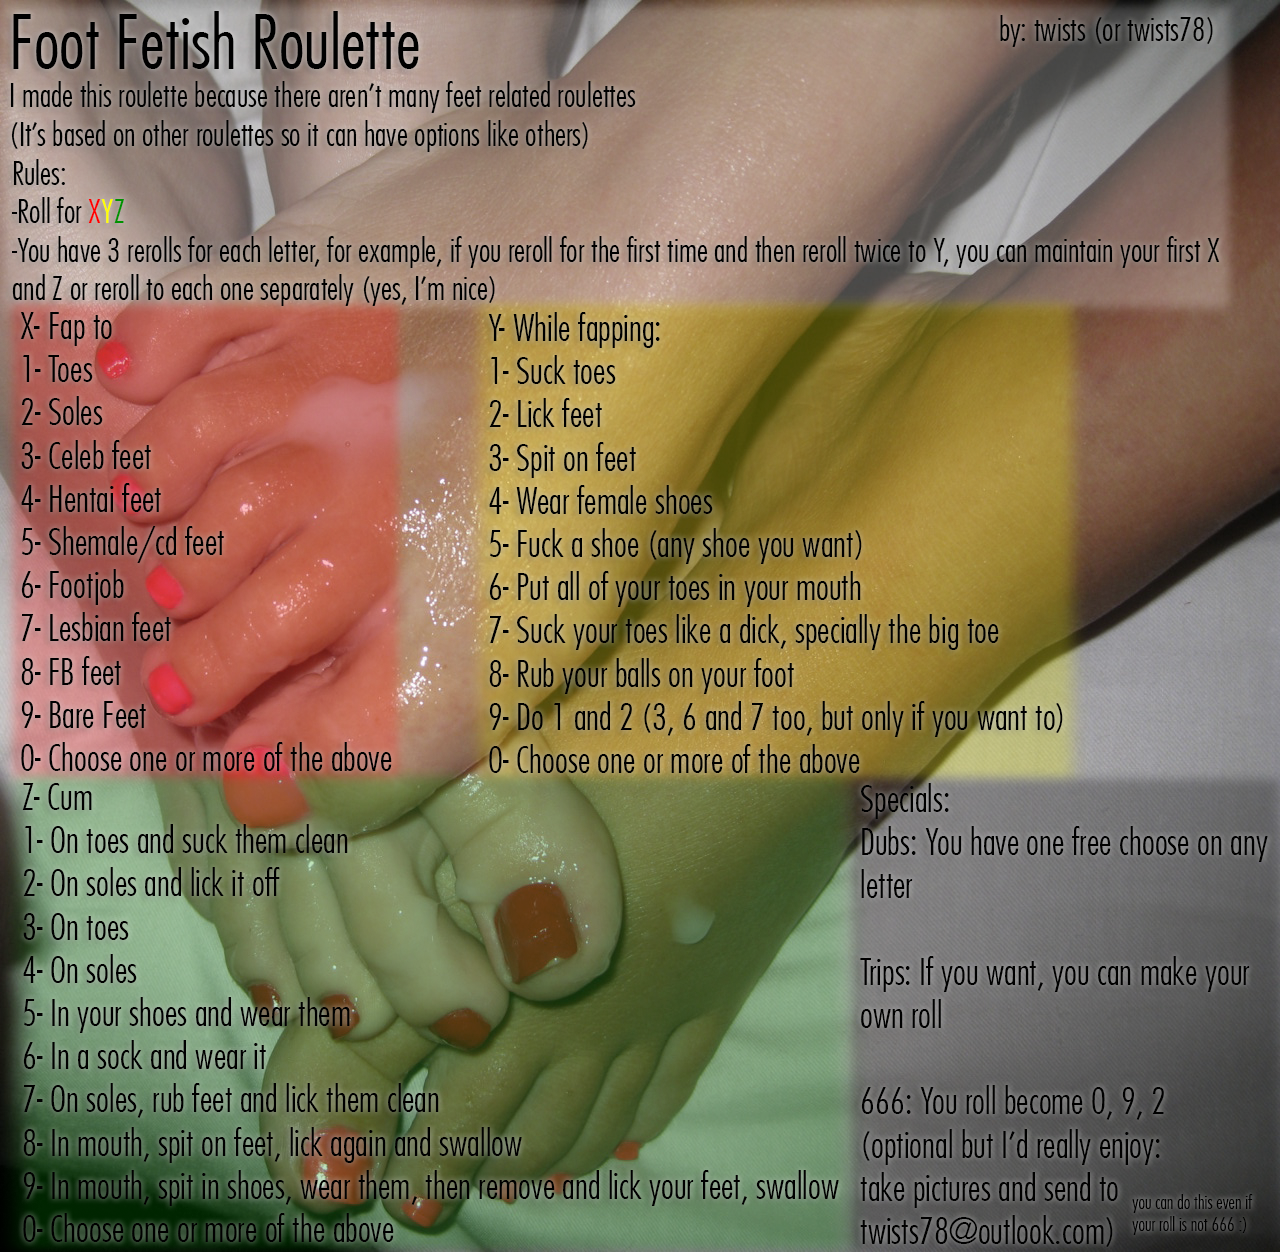 Fetish roulette